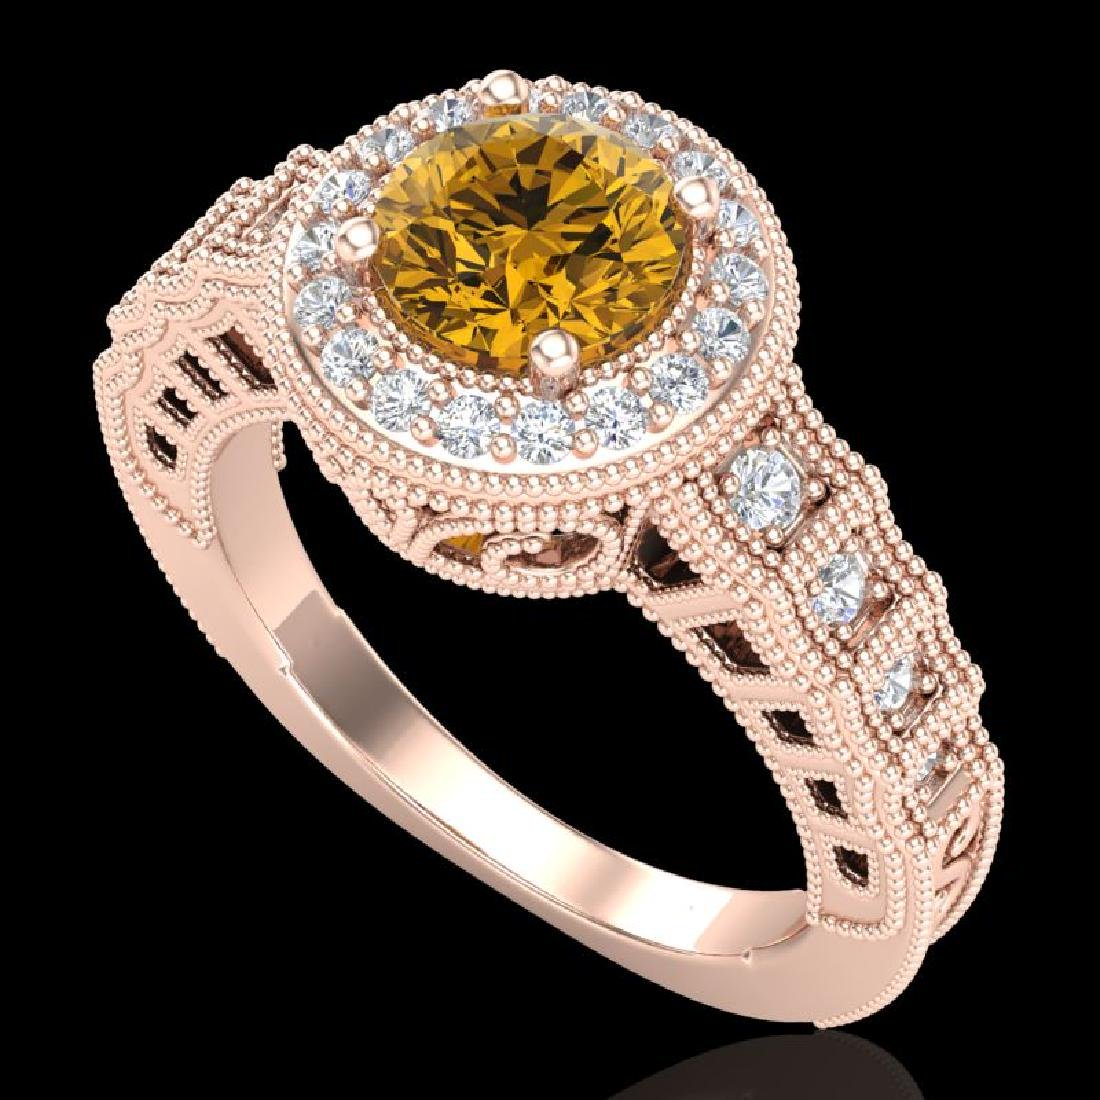 1.53 CTW Intense Fancy Yellow Diamond Engagement Art